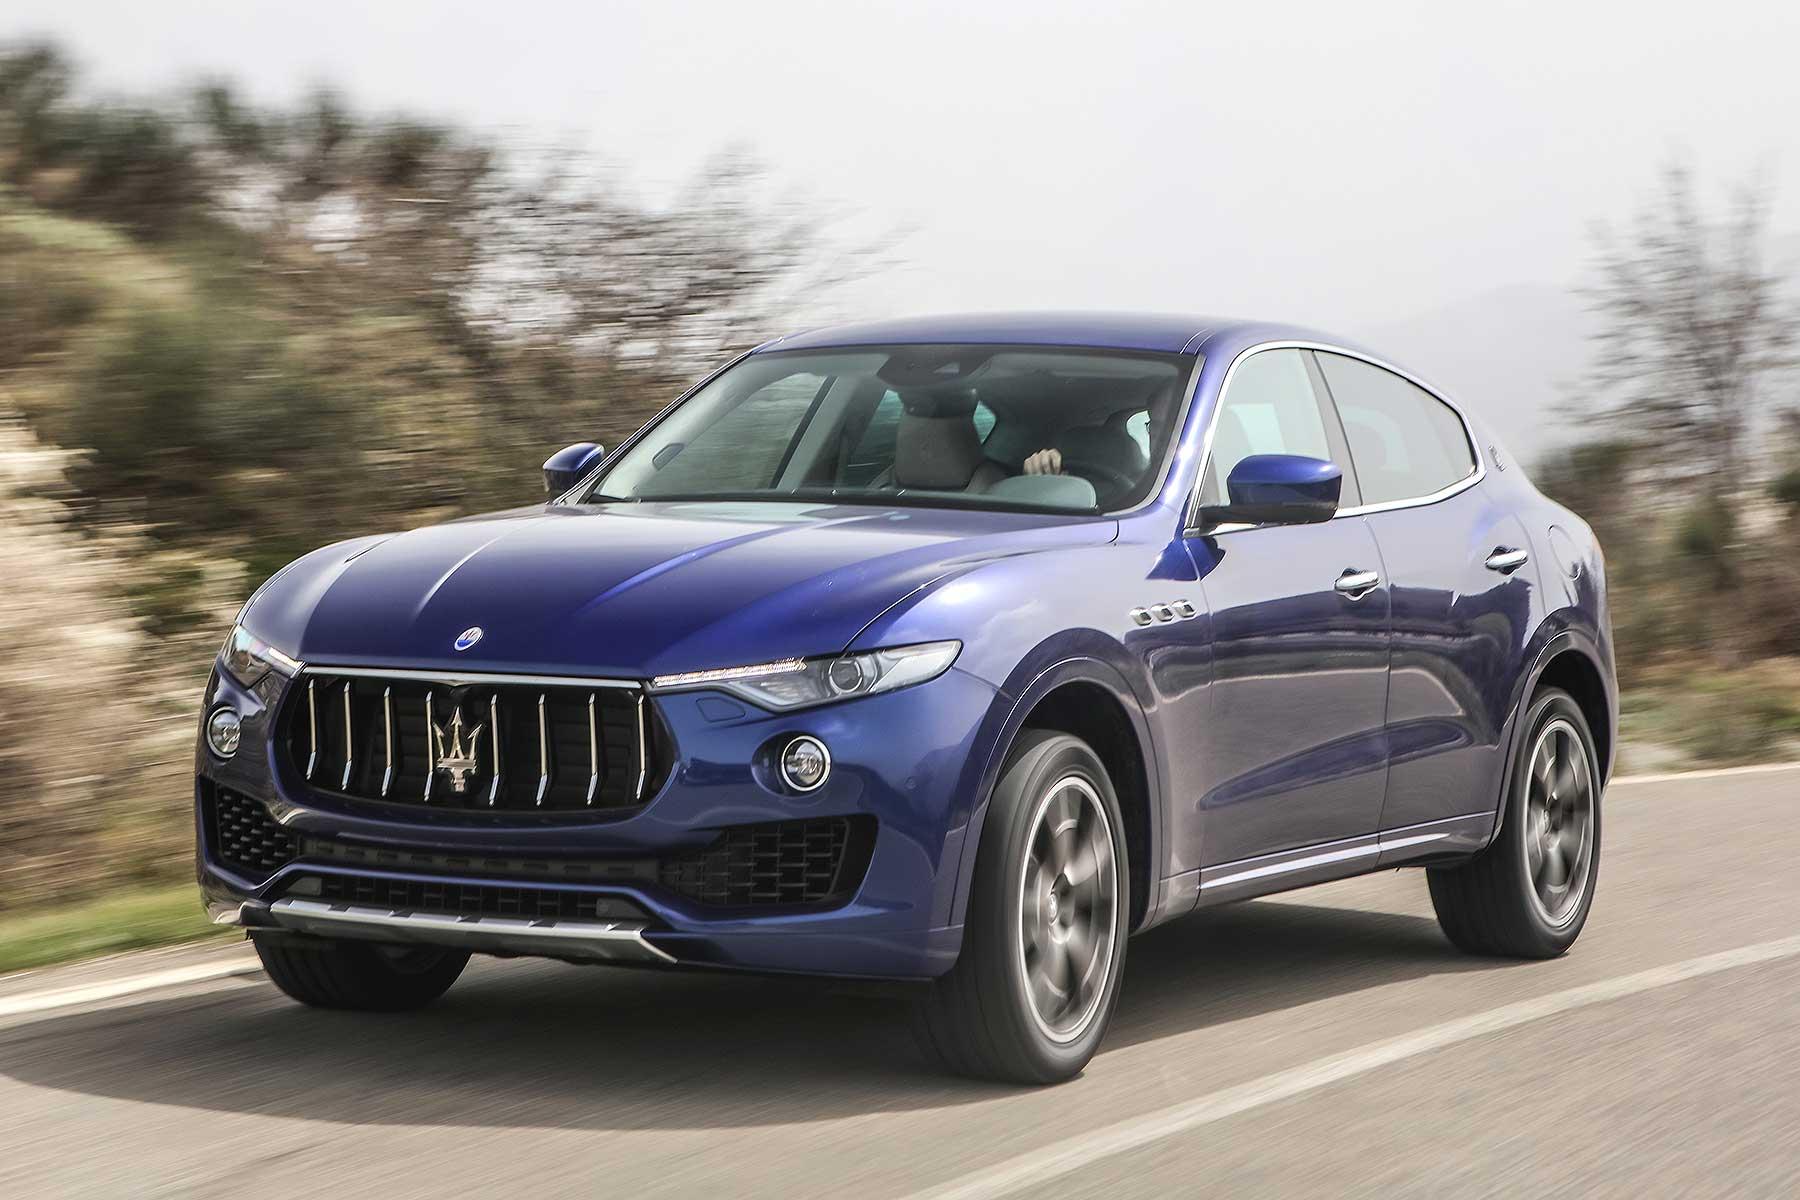 2016 Maserati Levante review: can Maserati really make an SUV? | Motoring Research